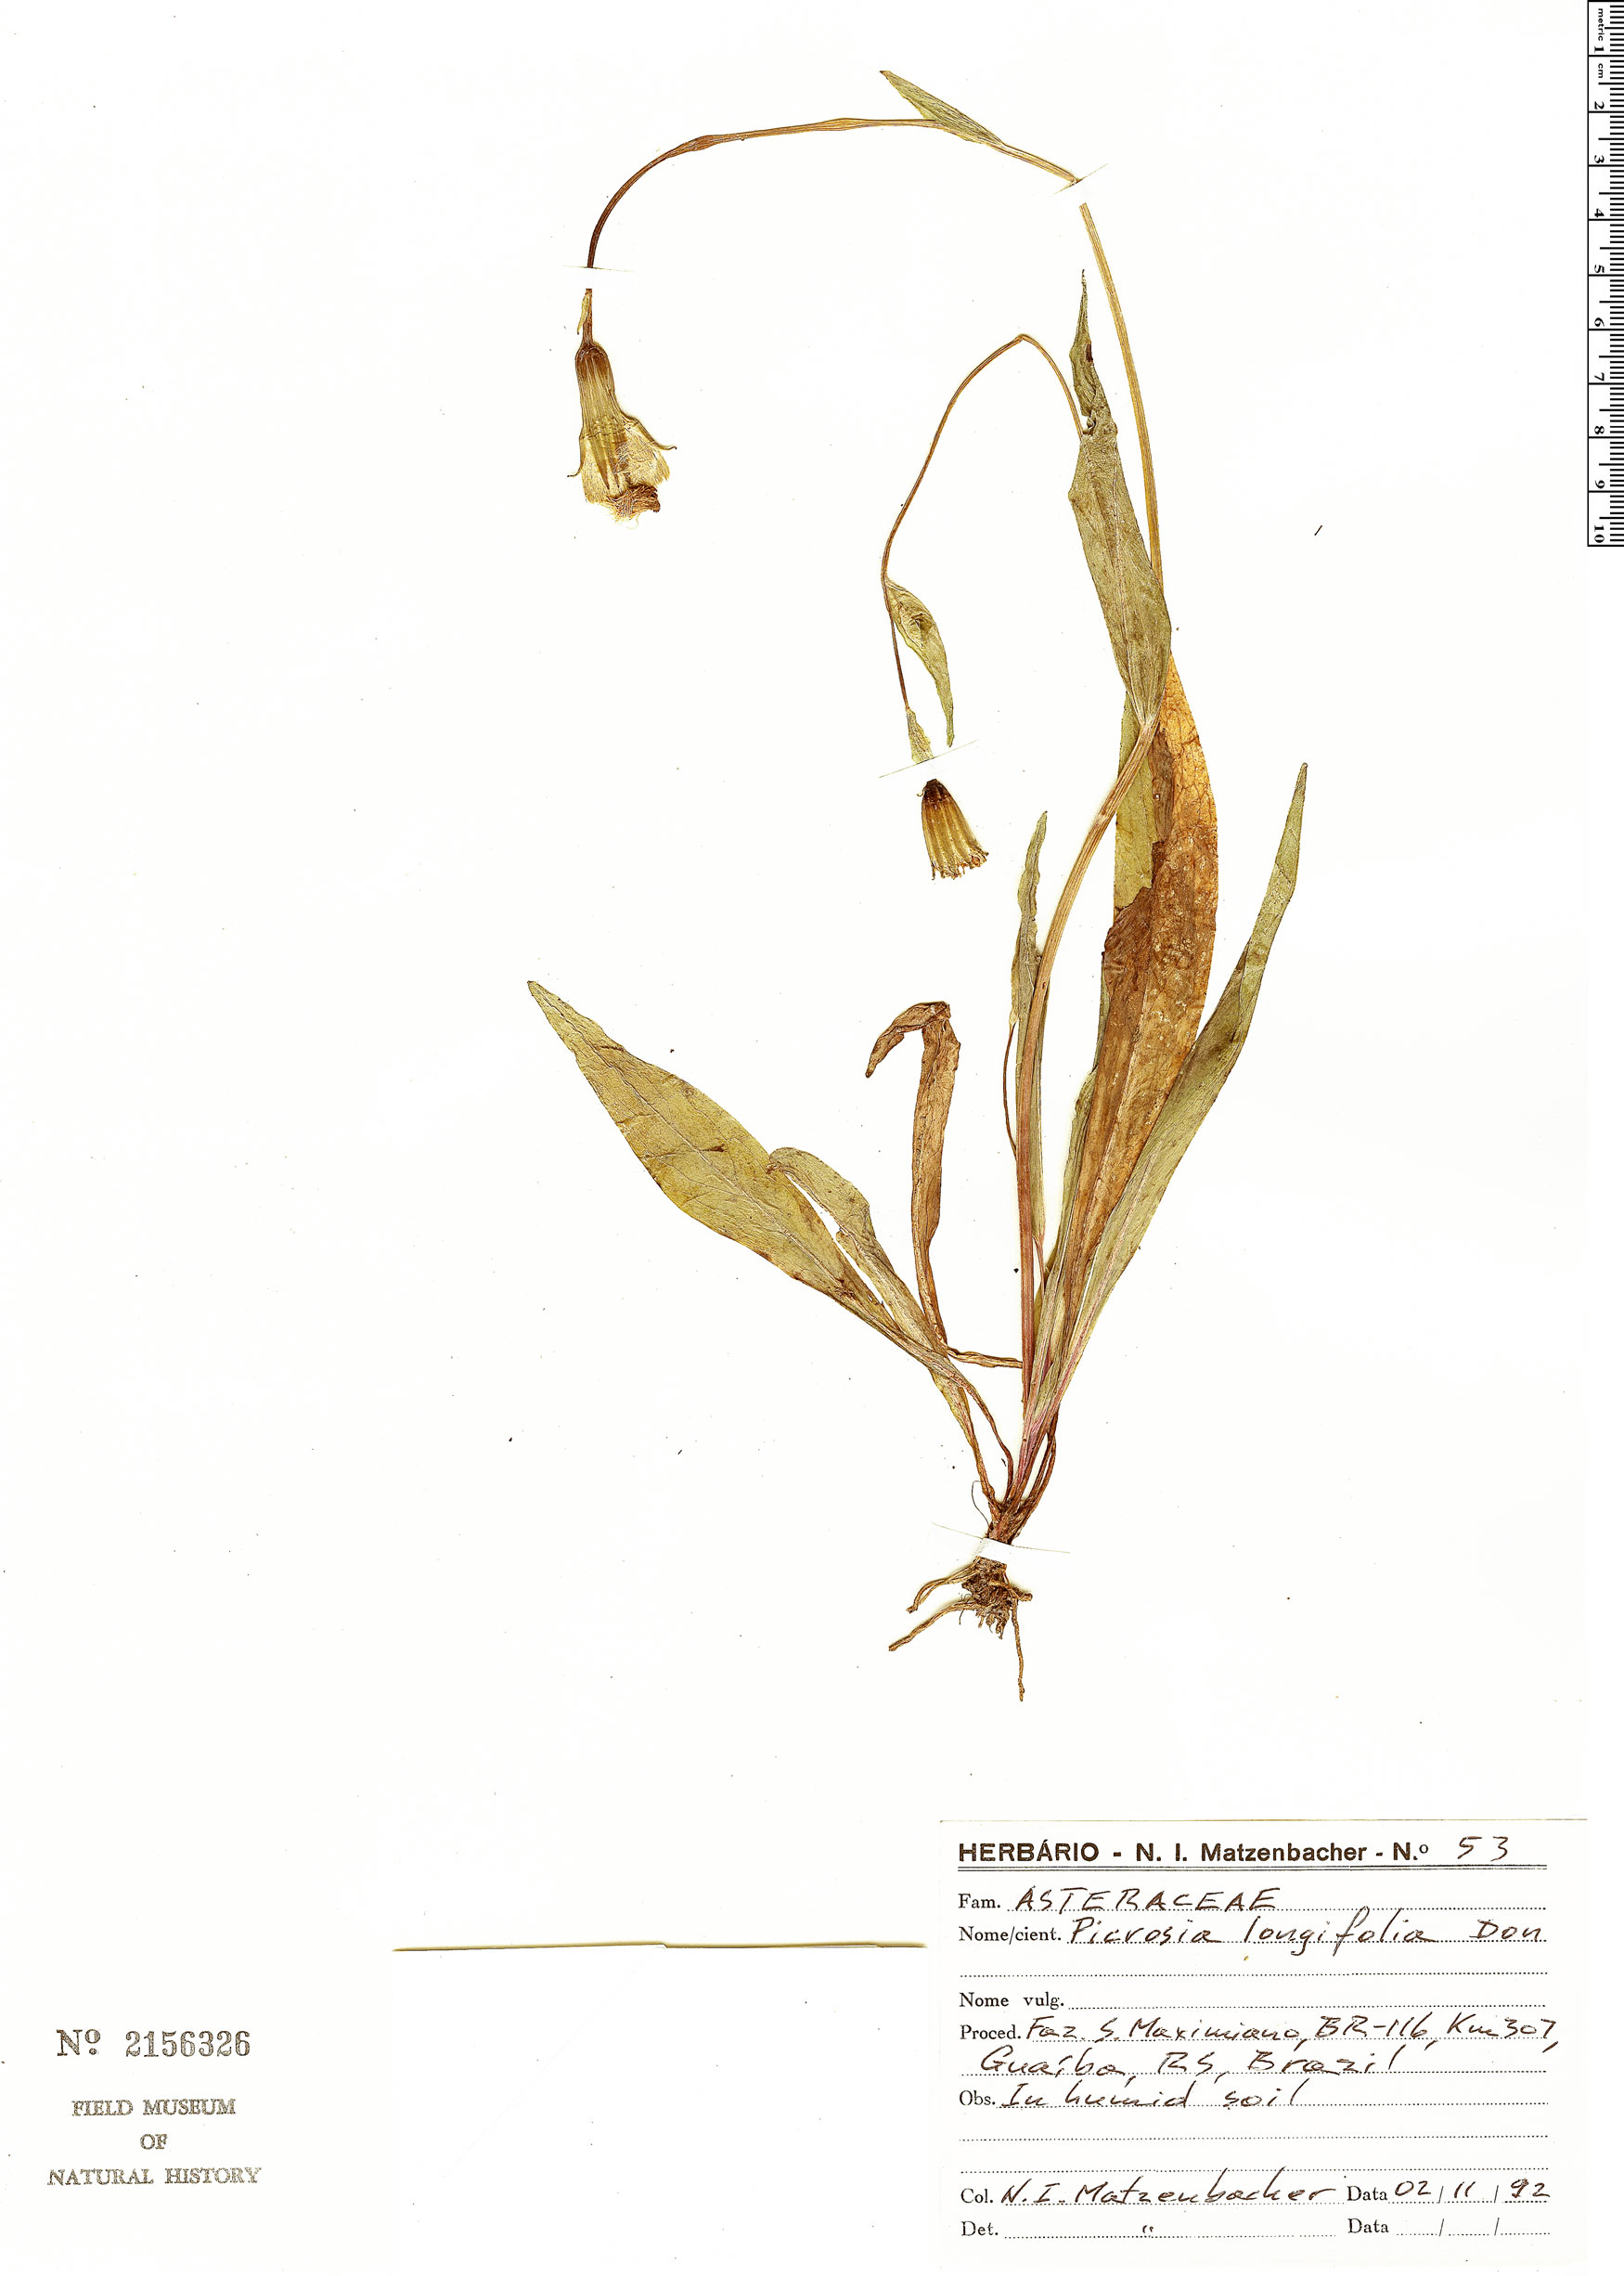 Picrosia image